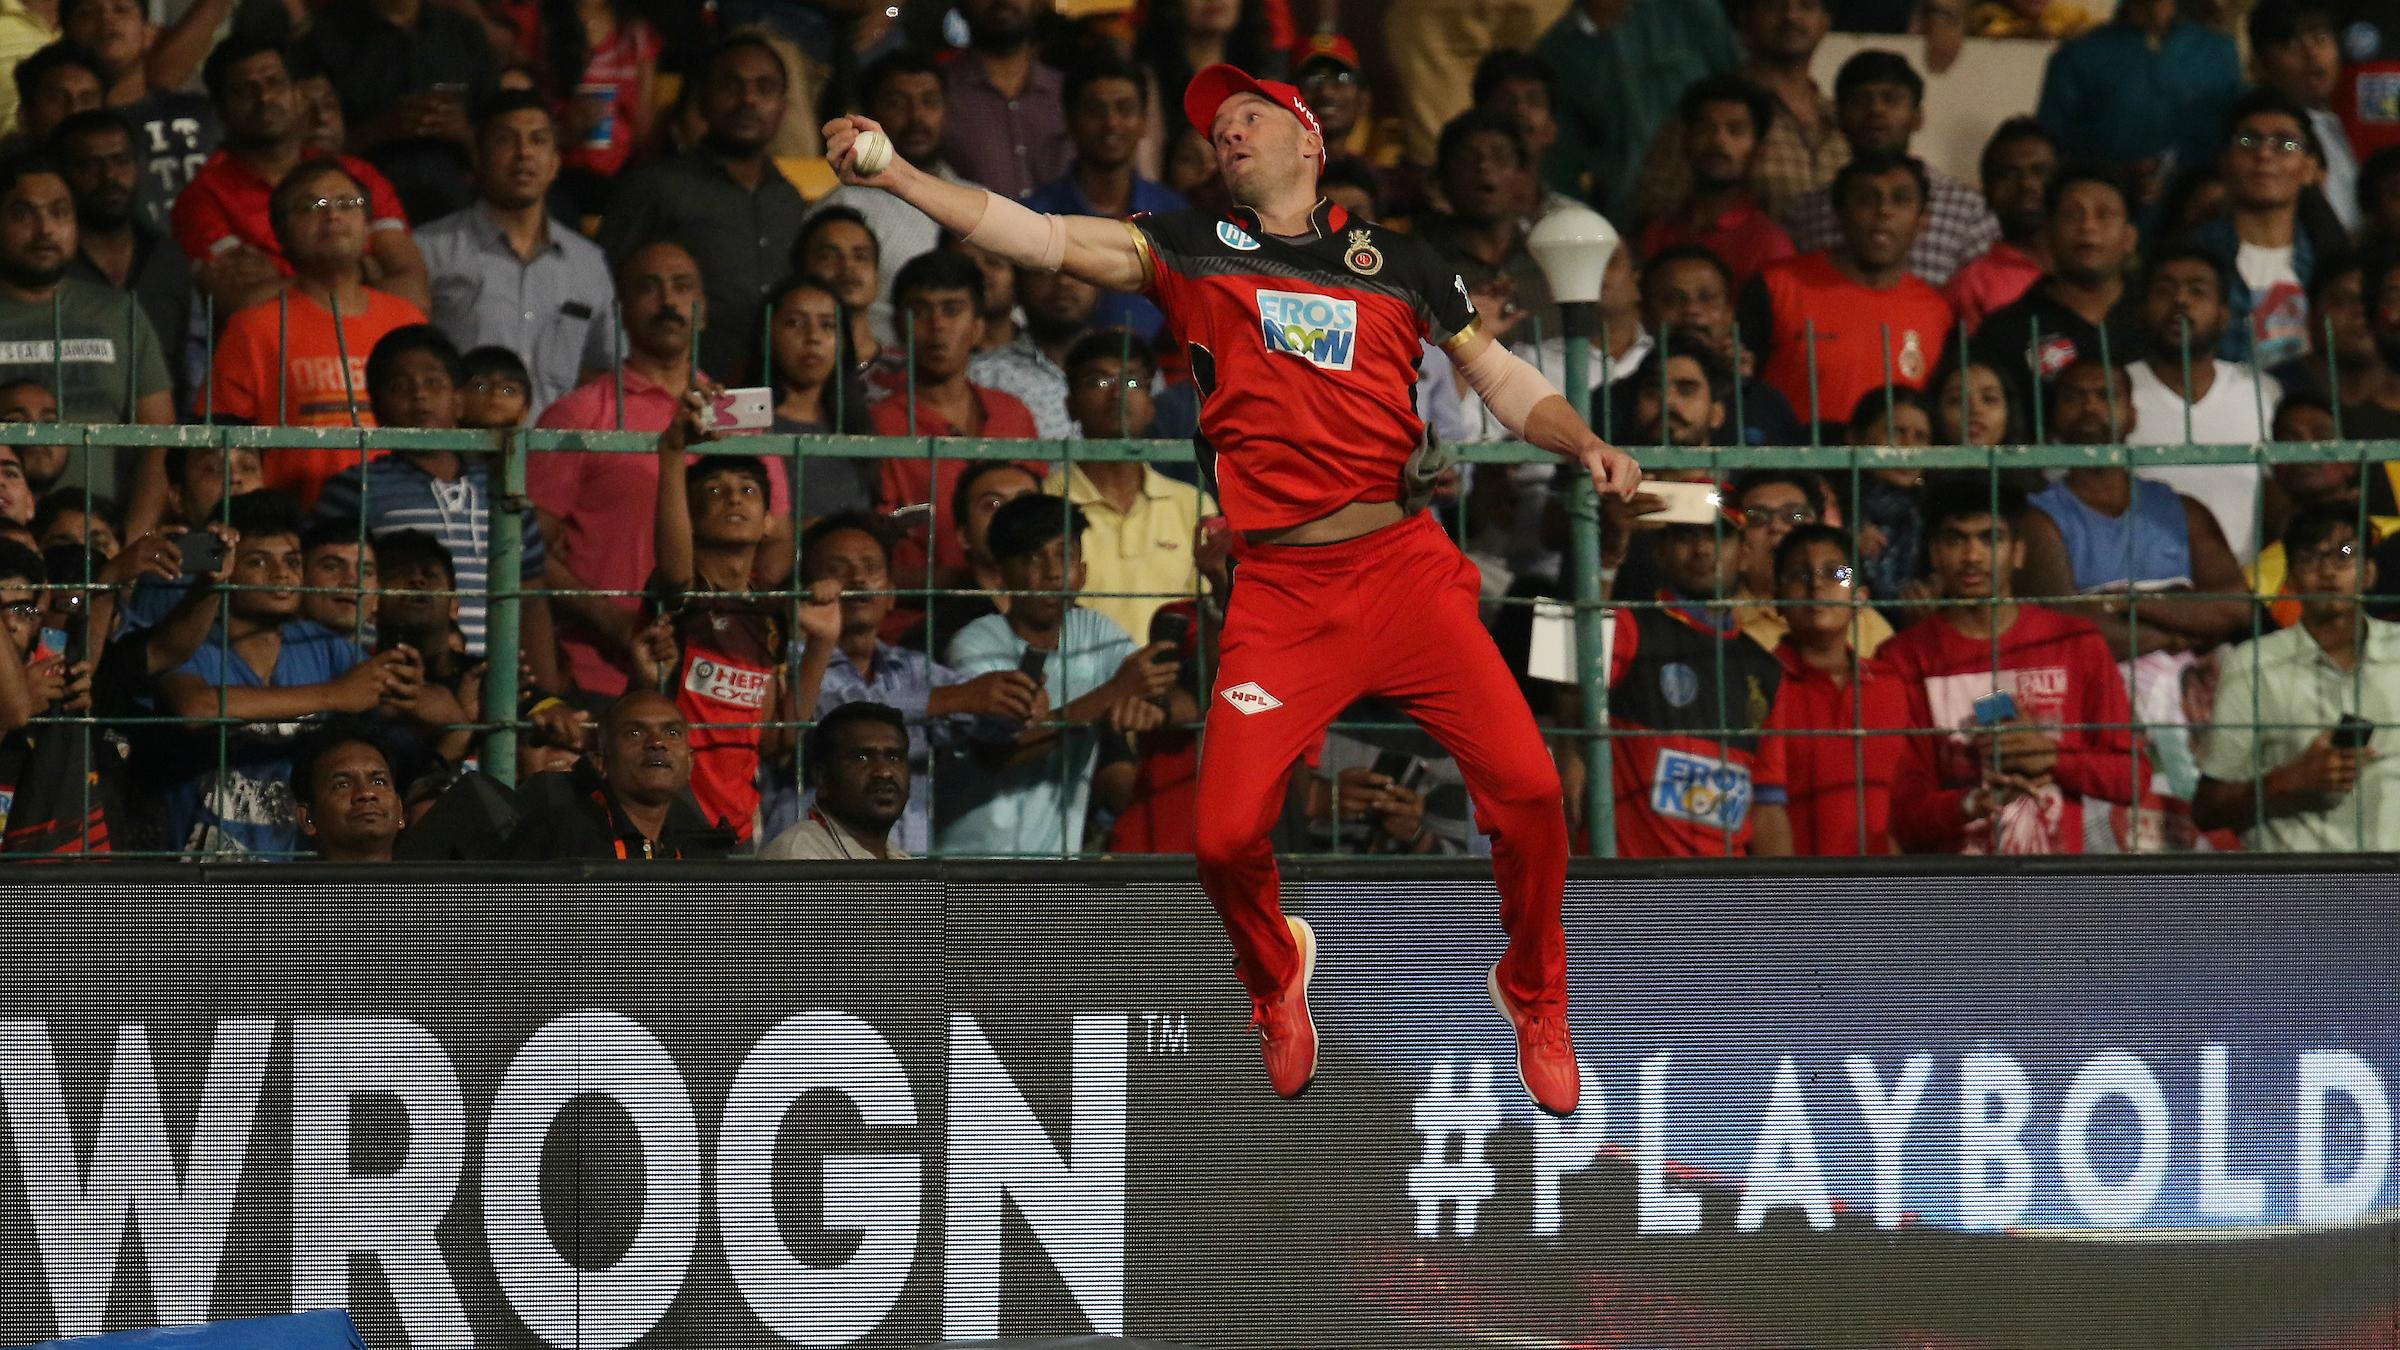 The AB de Villiers catch that defied gravity